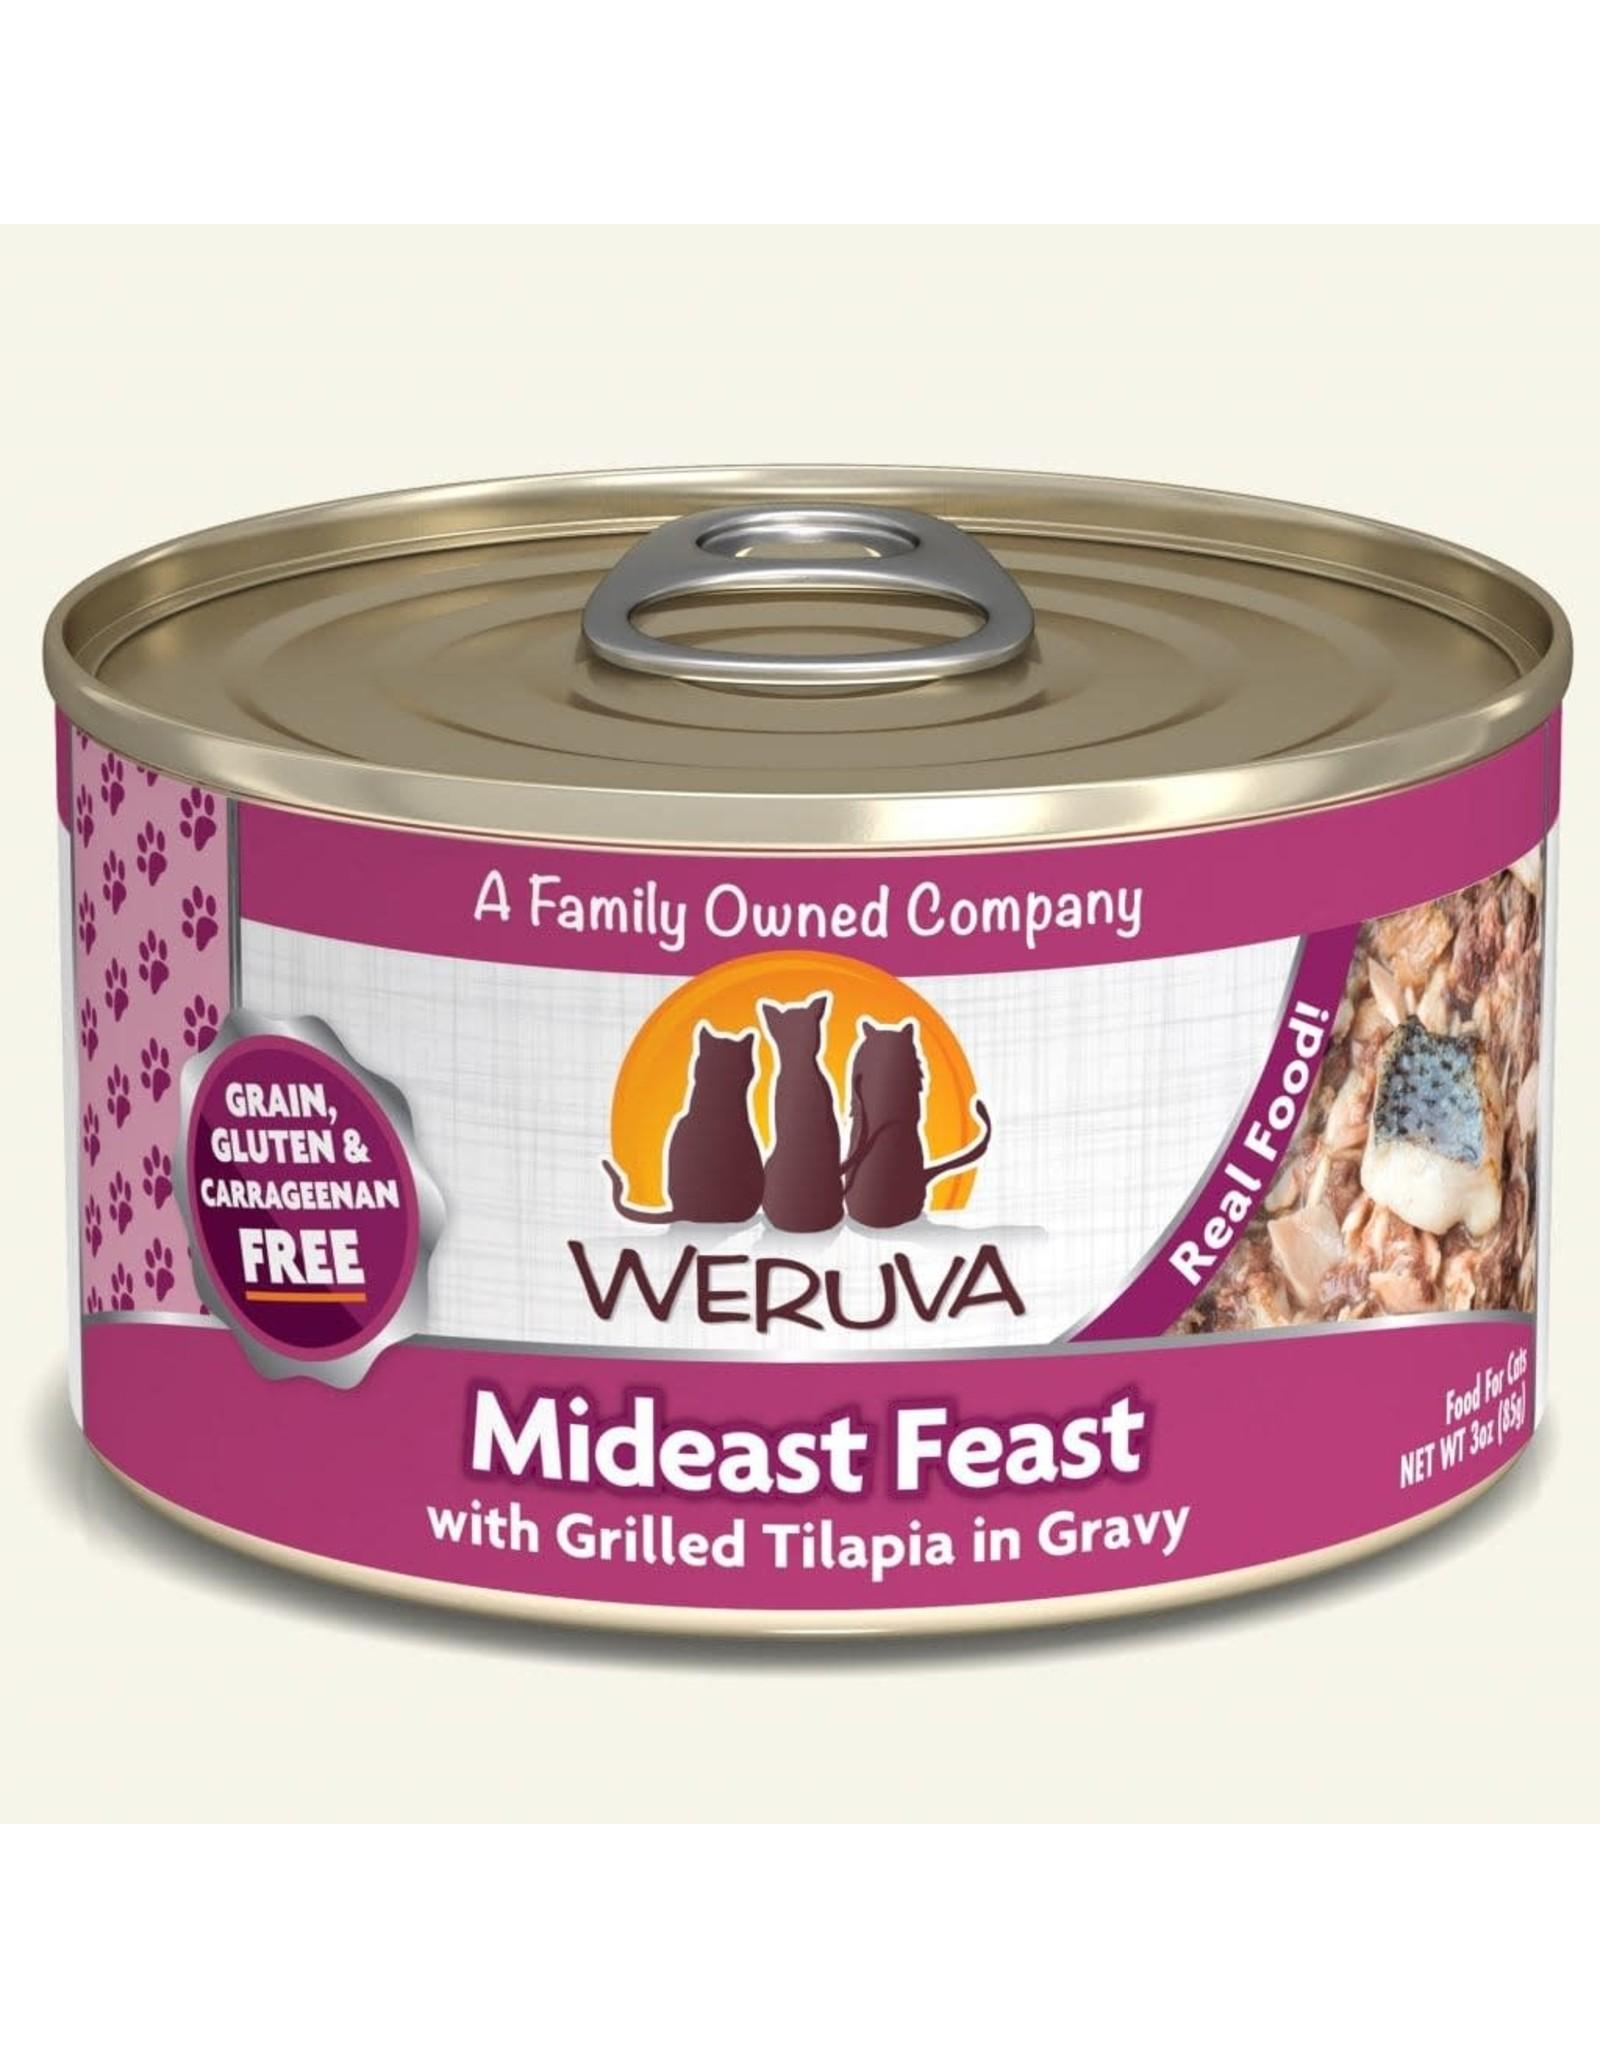 Weruva Weruva Mideast Feast Cat food 5.5oz